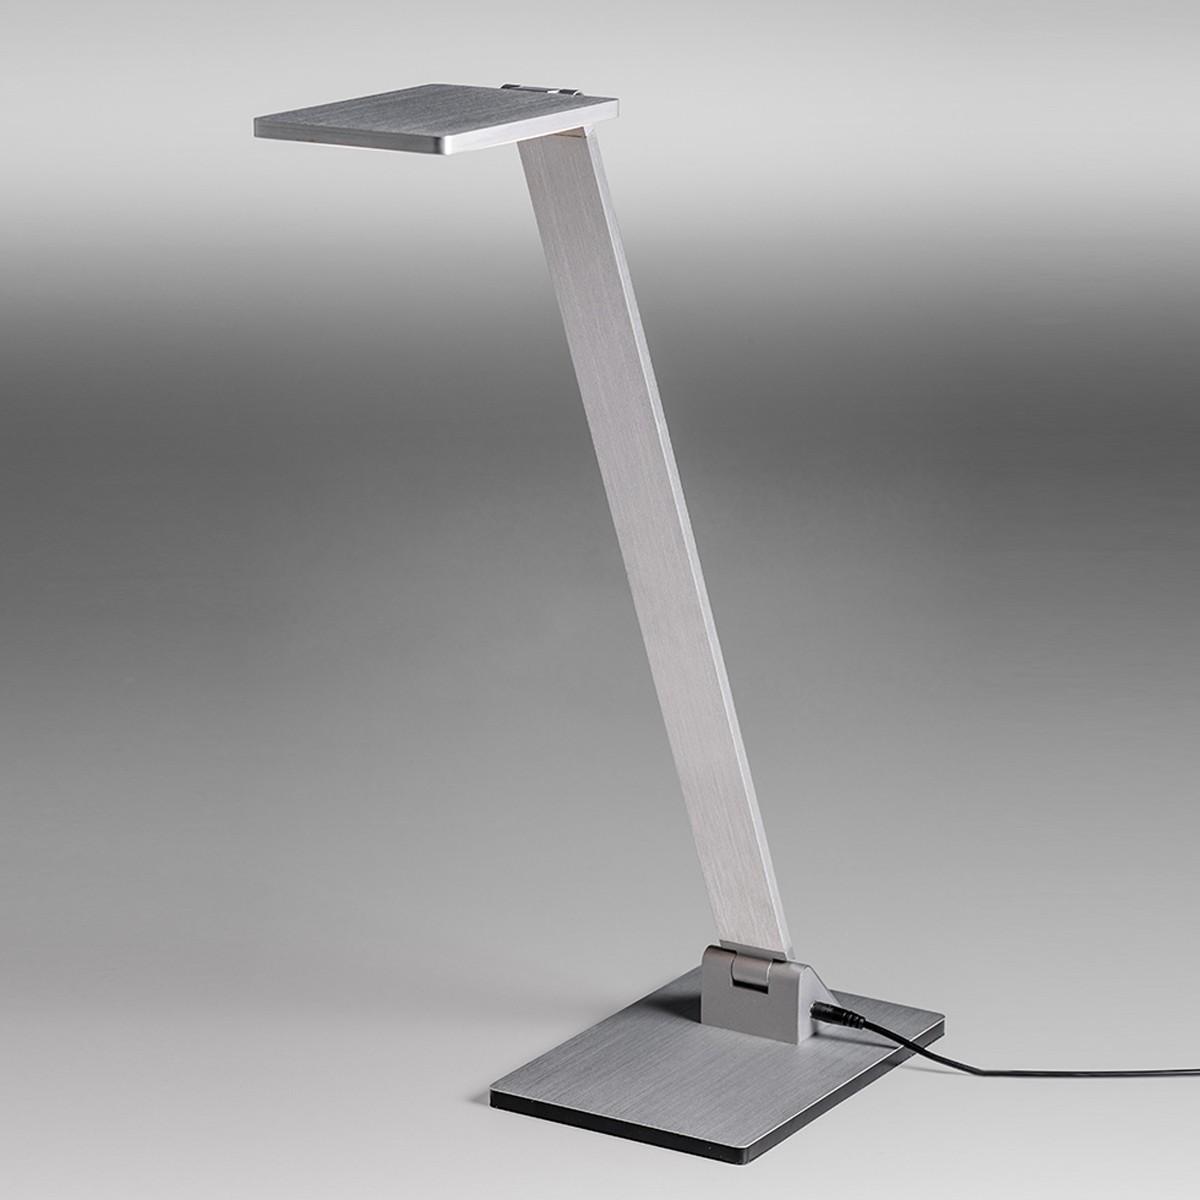 Lupia Licht Magister Tischleuchte, Aluminium matt